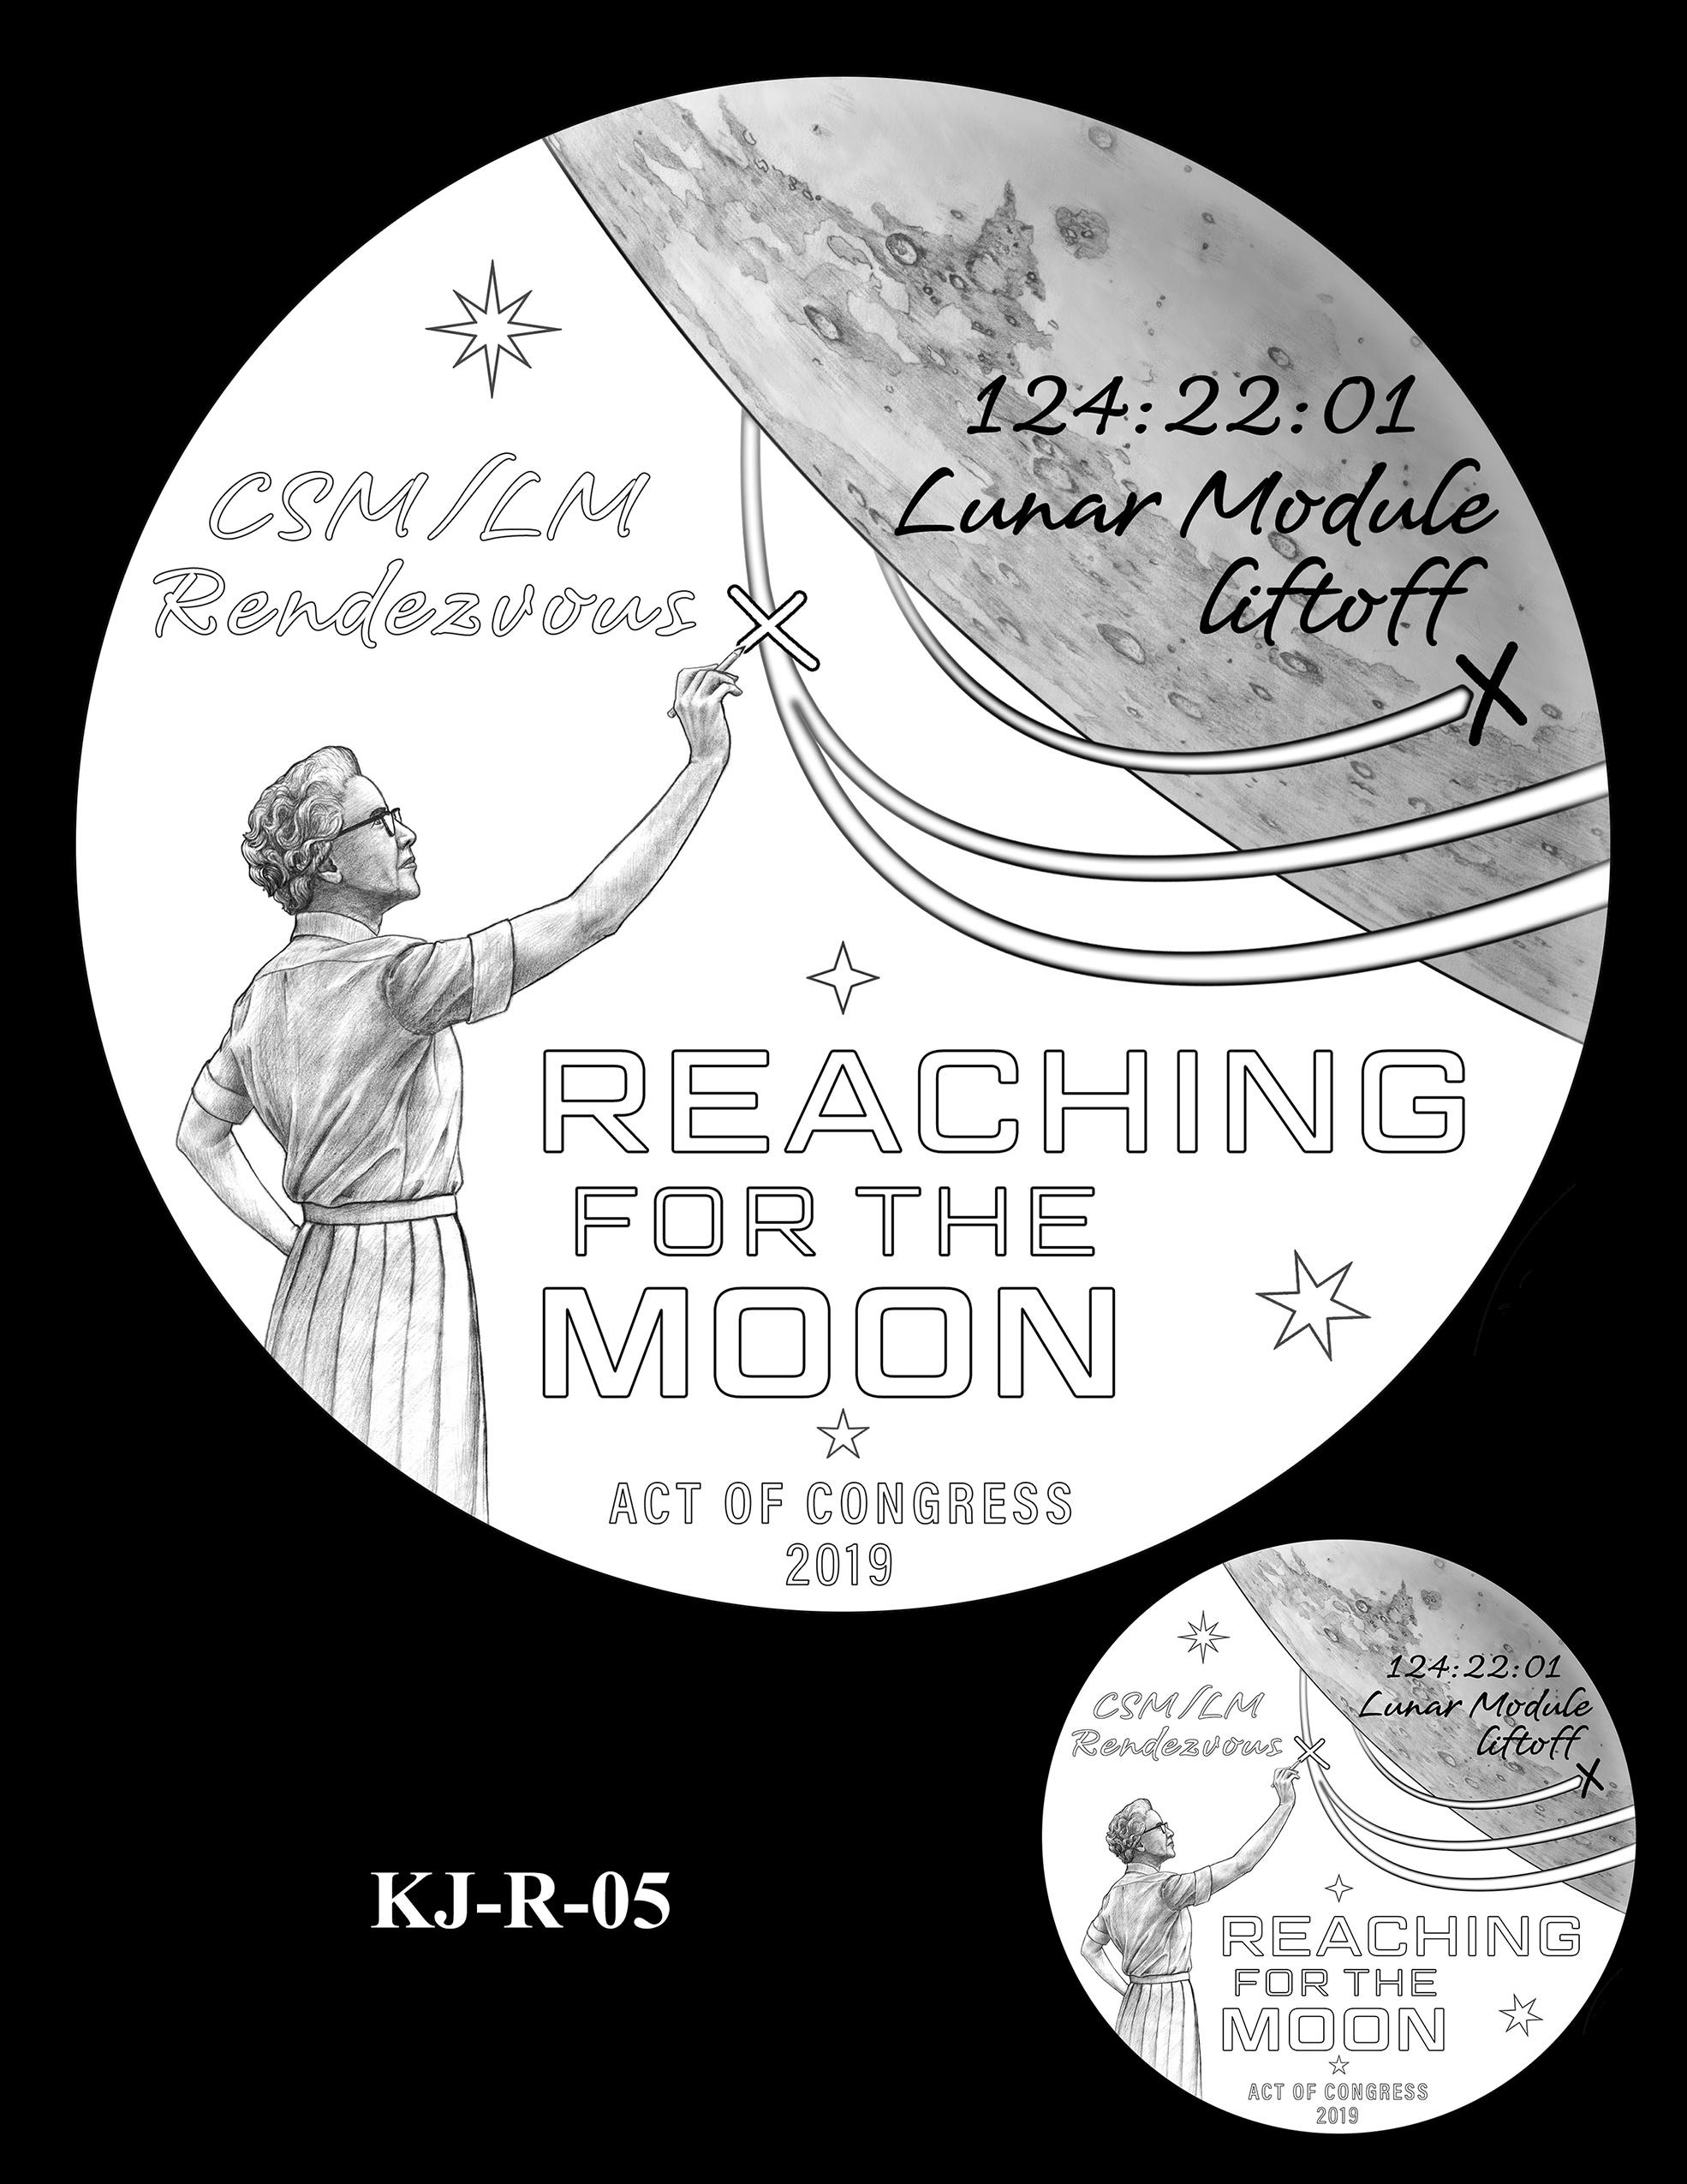 KJ-R-05 -- Katherine Johnson Congressional Gold Medal